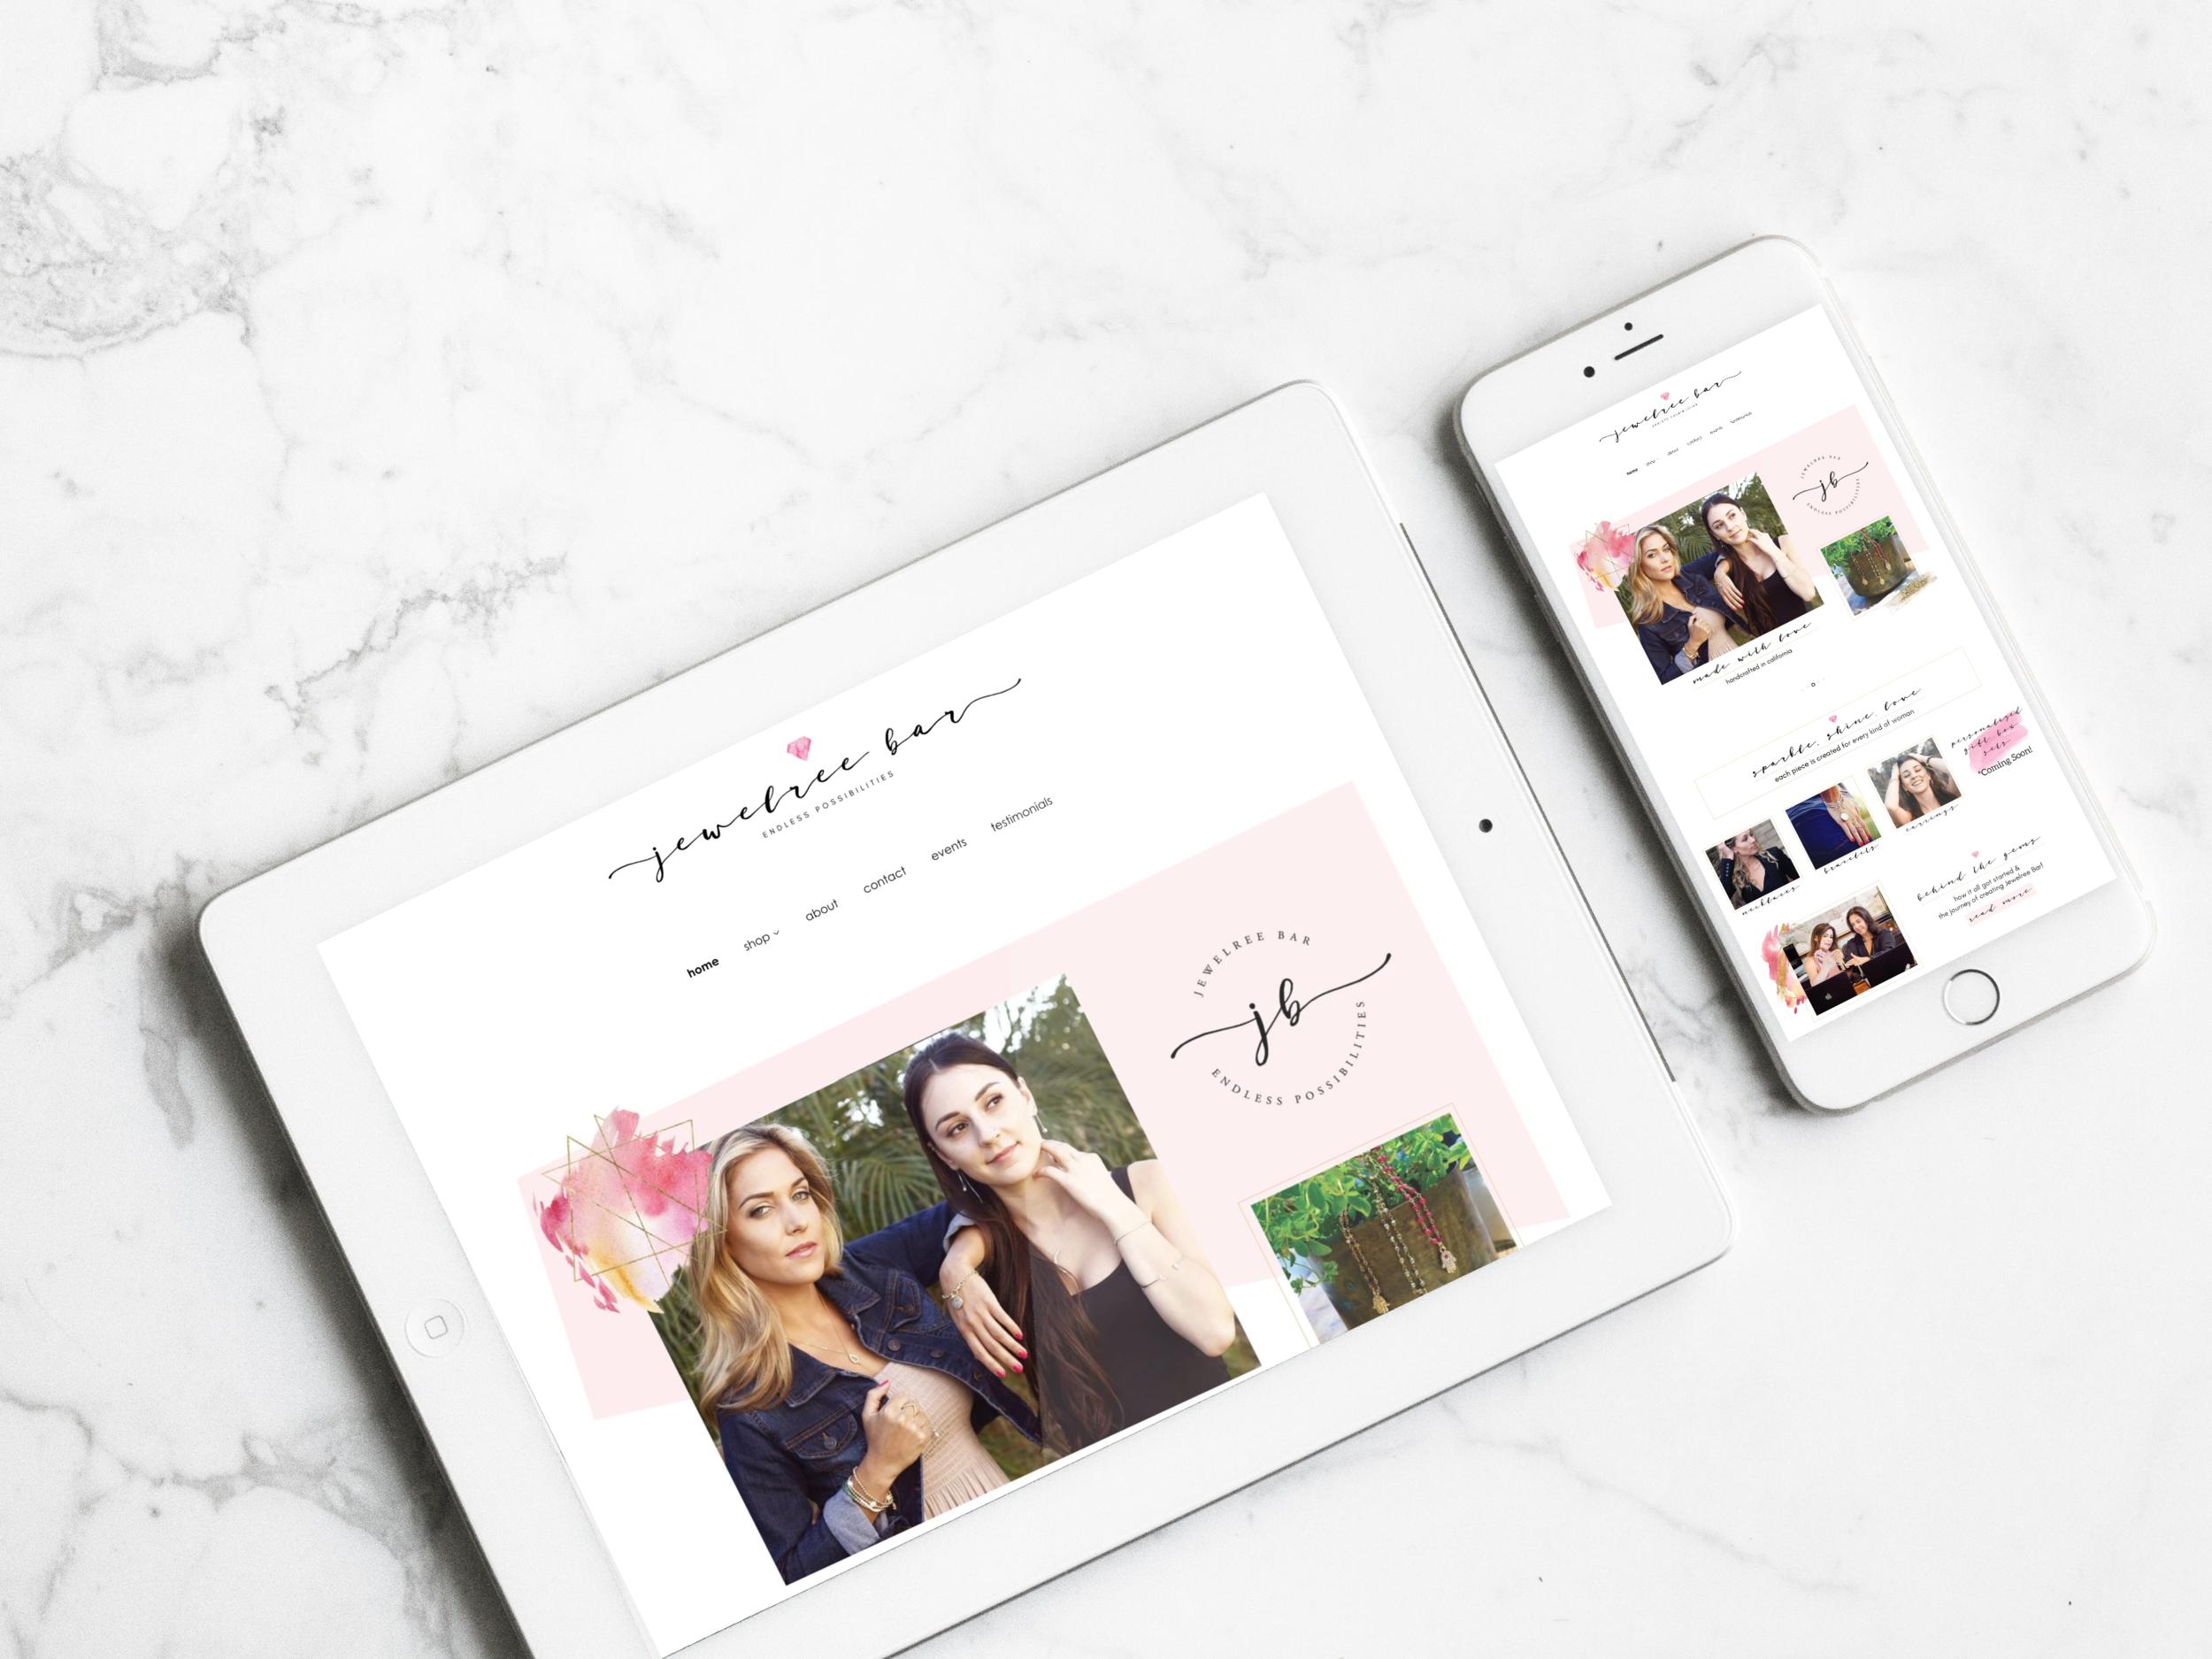 jgd | jewelree bar squarespace website design.png